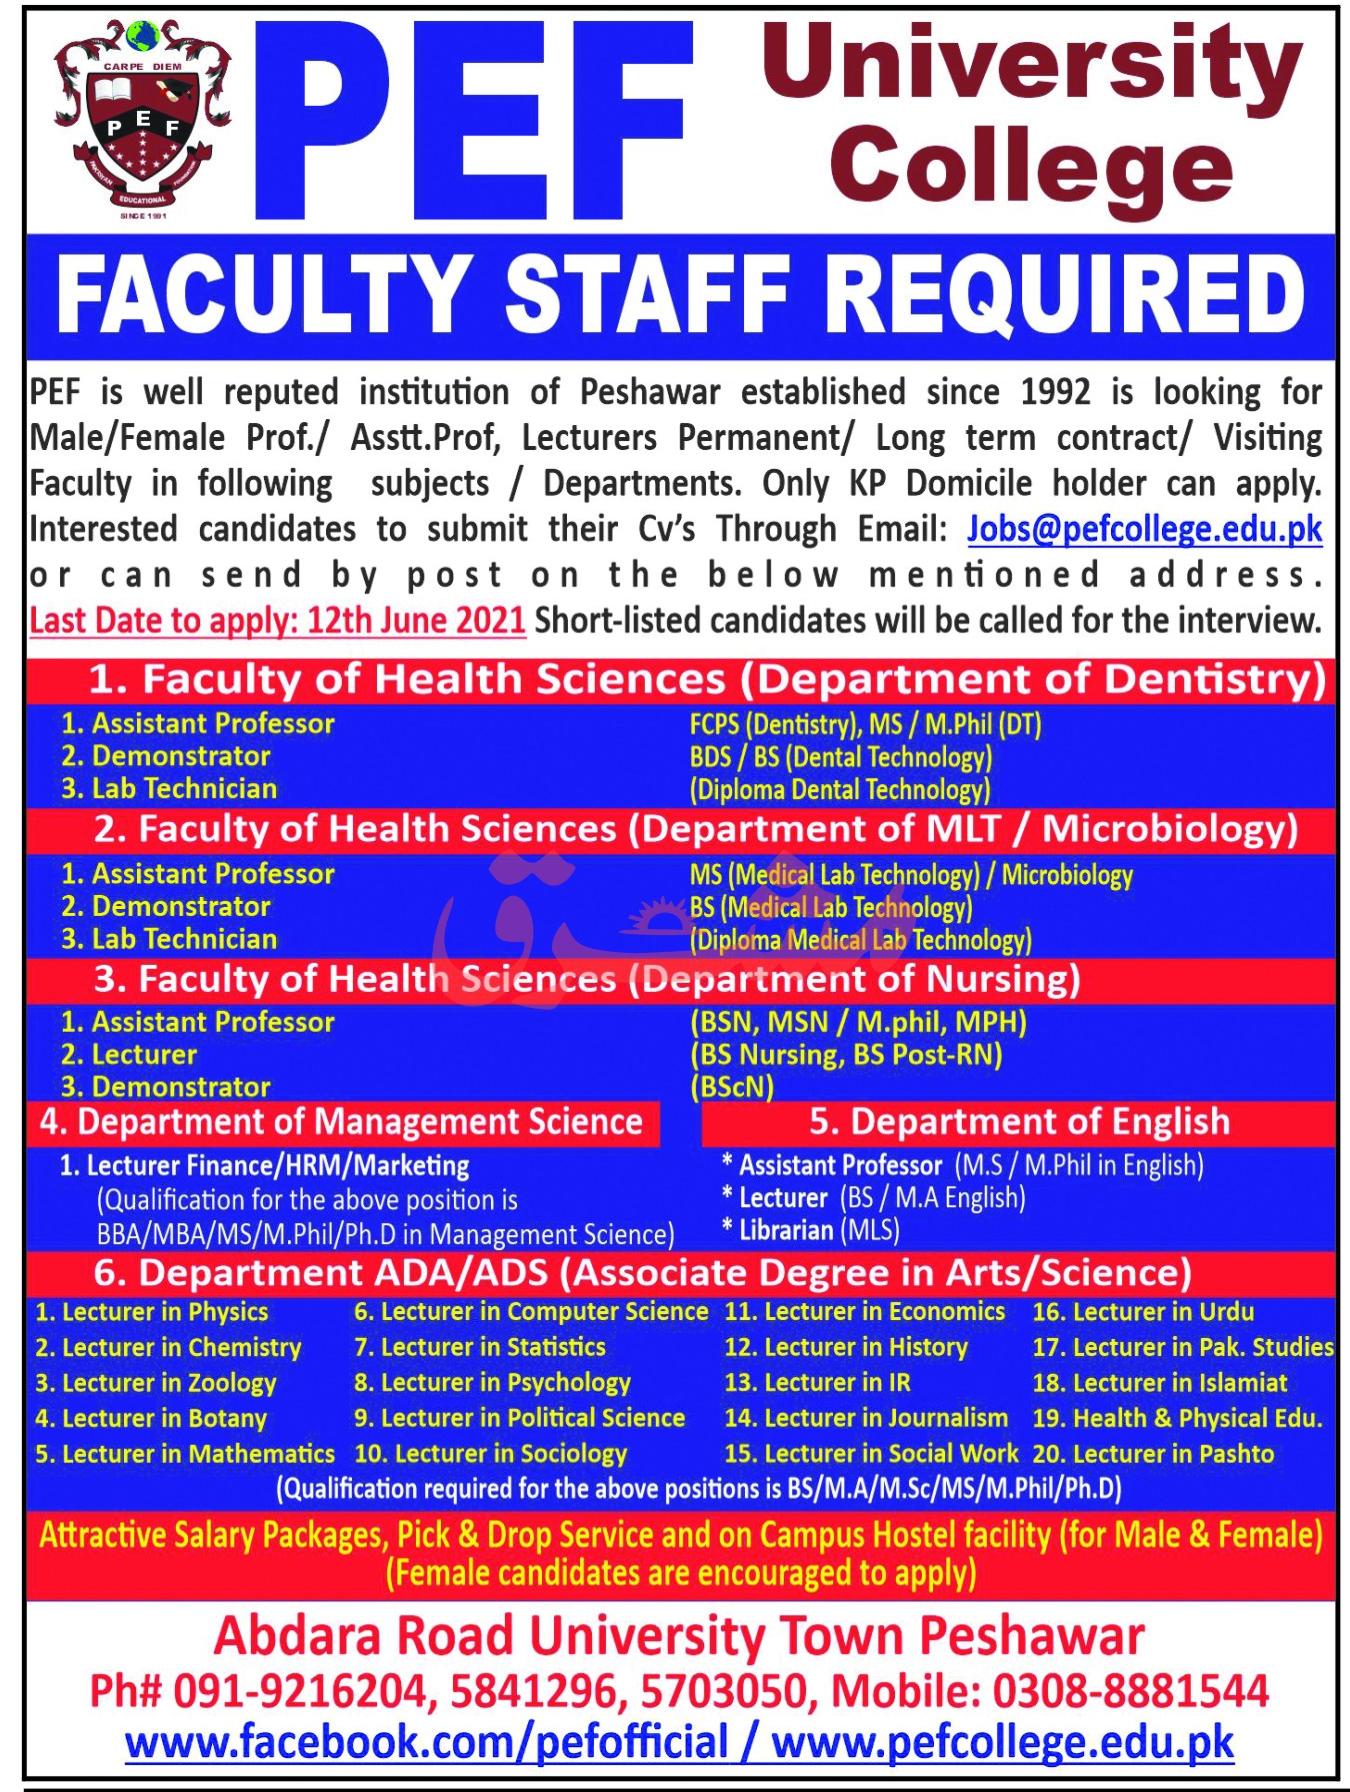 Jobs@pefcollege.edu.pk - PEF University College Jobs 2021 in Pakistan